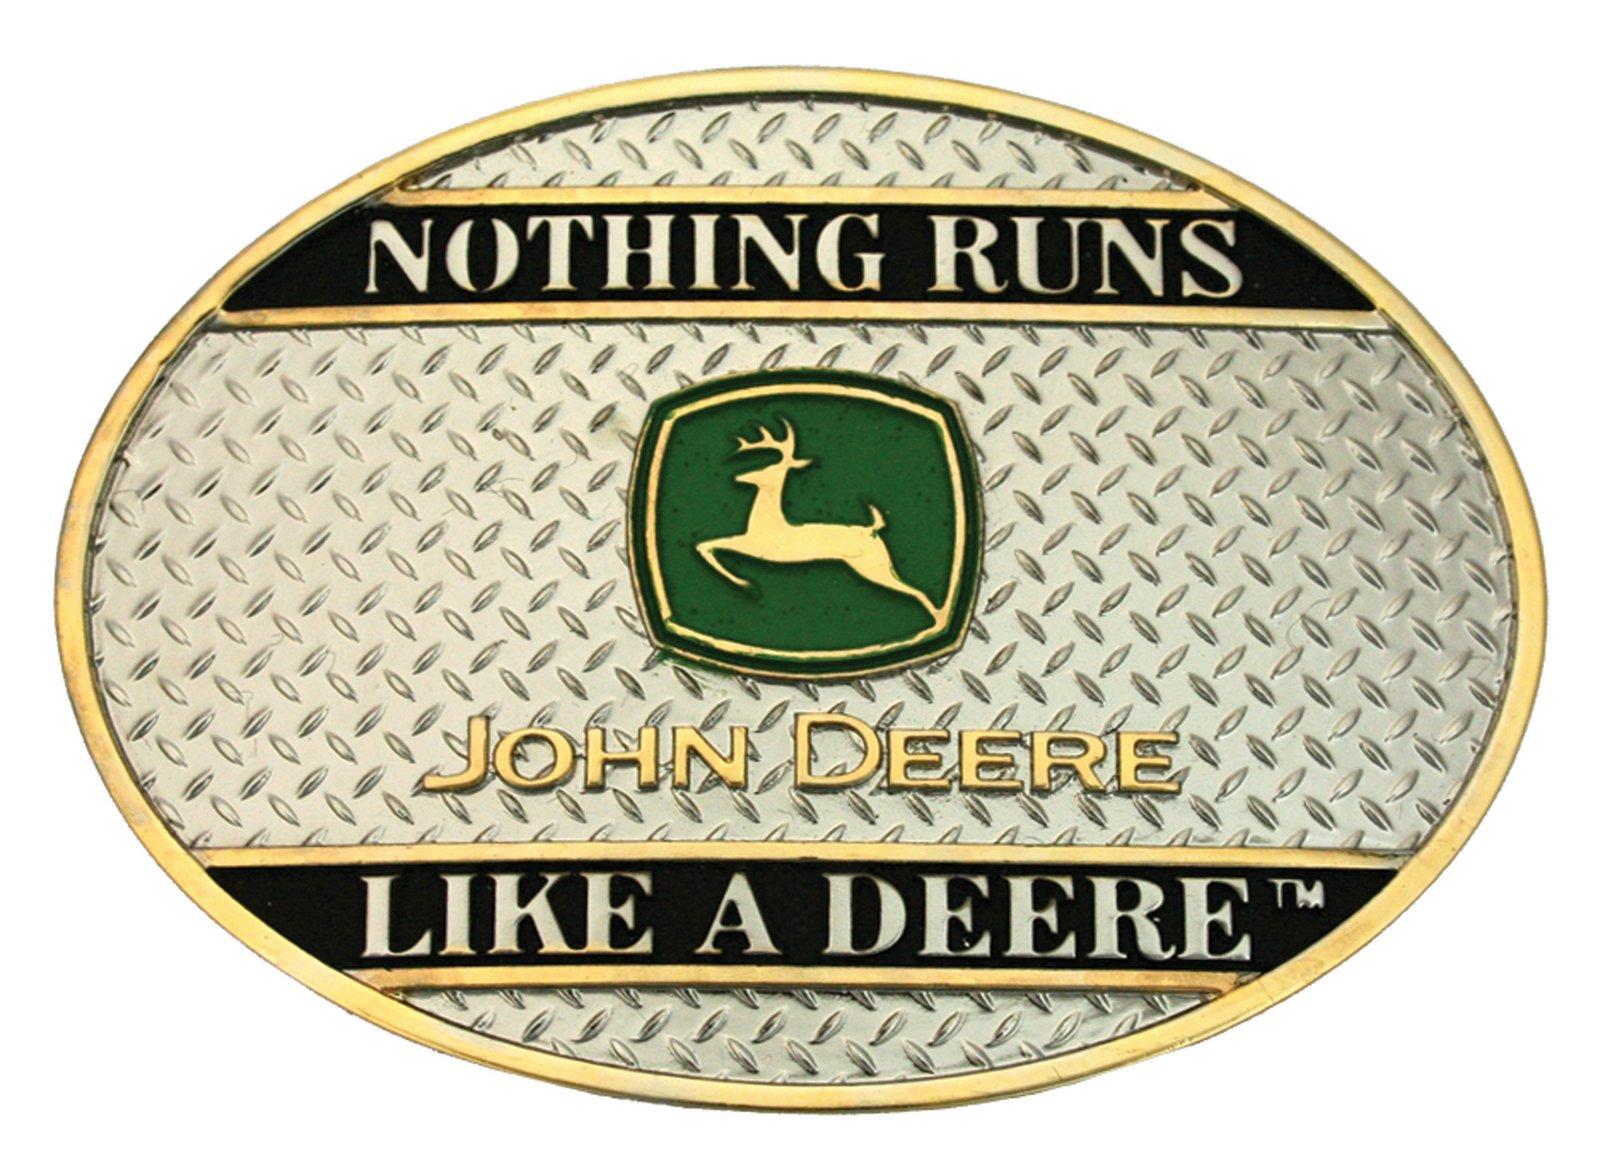 Montana Silversmiths John Deere: Nothing Runs Like A Deere On Sheet Metal Attitude Buckle